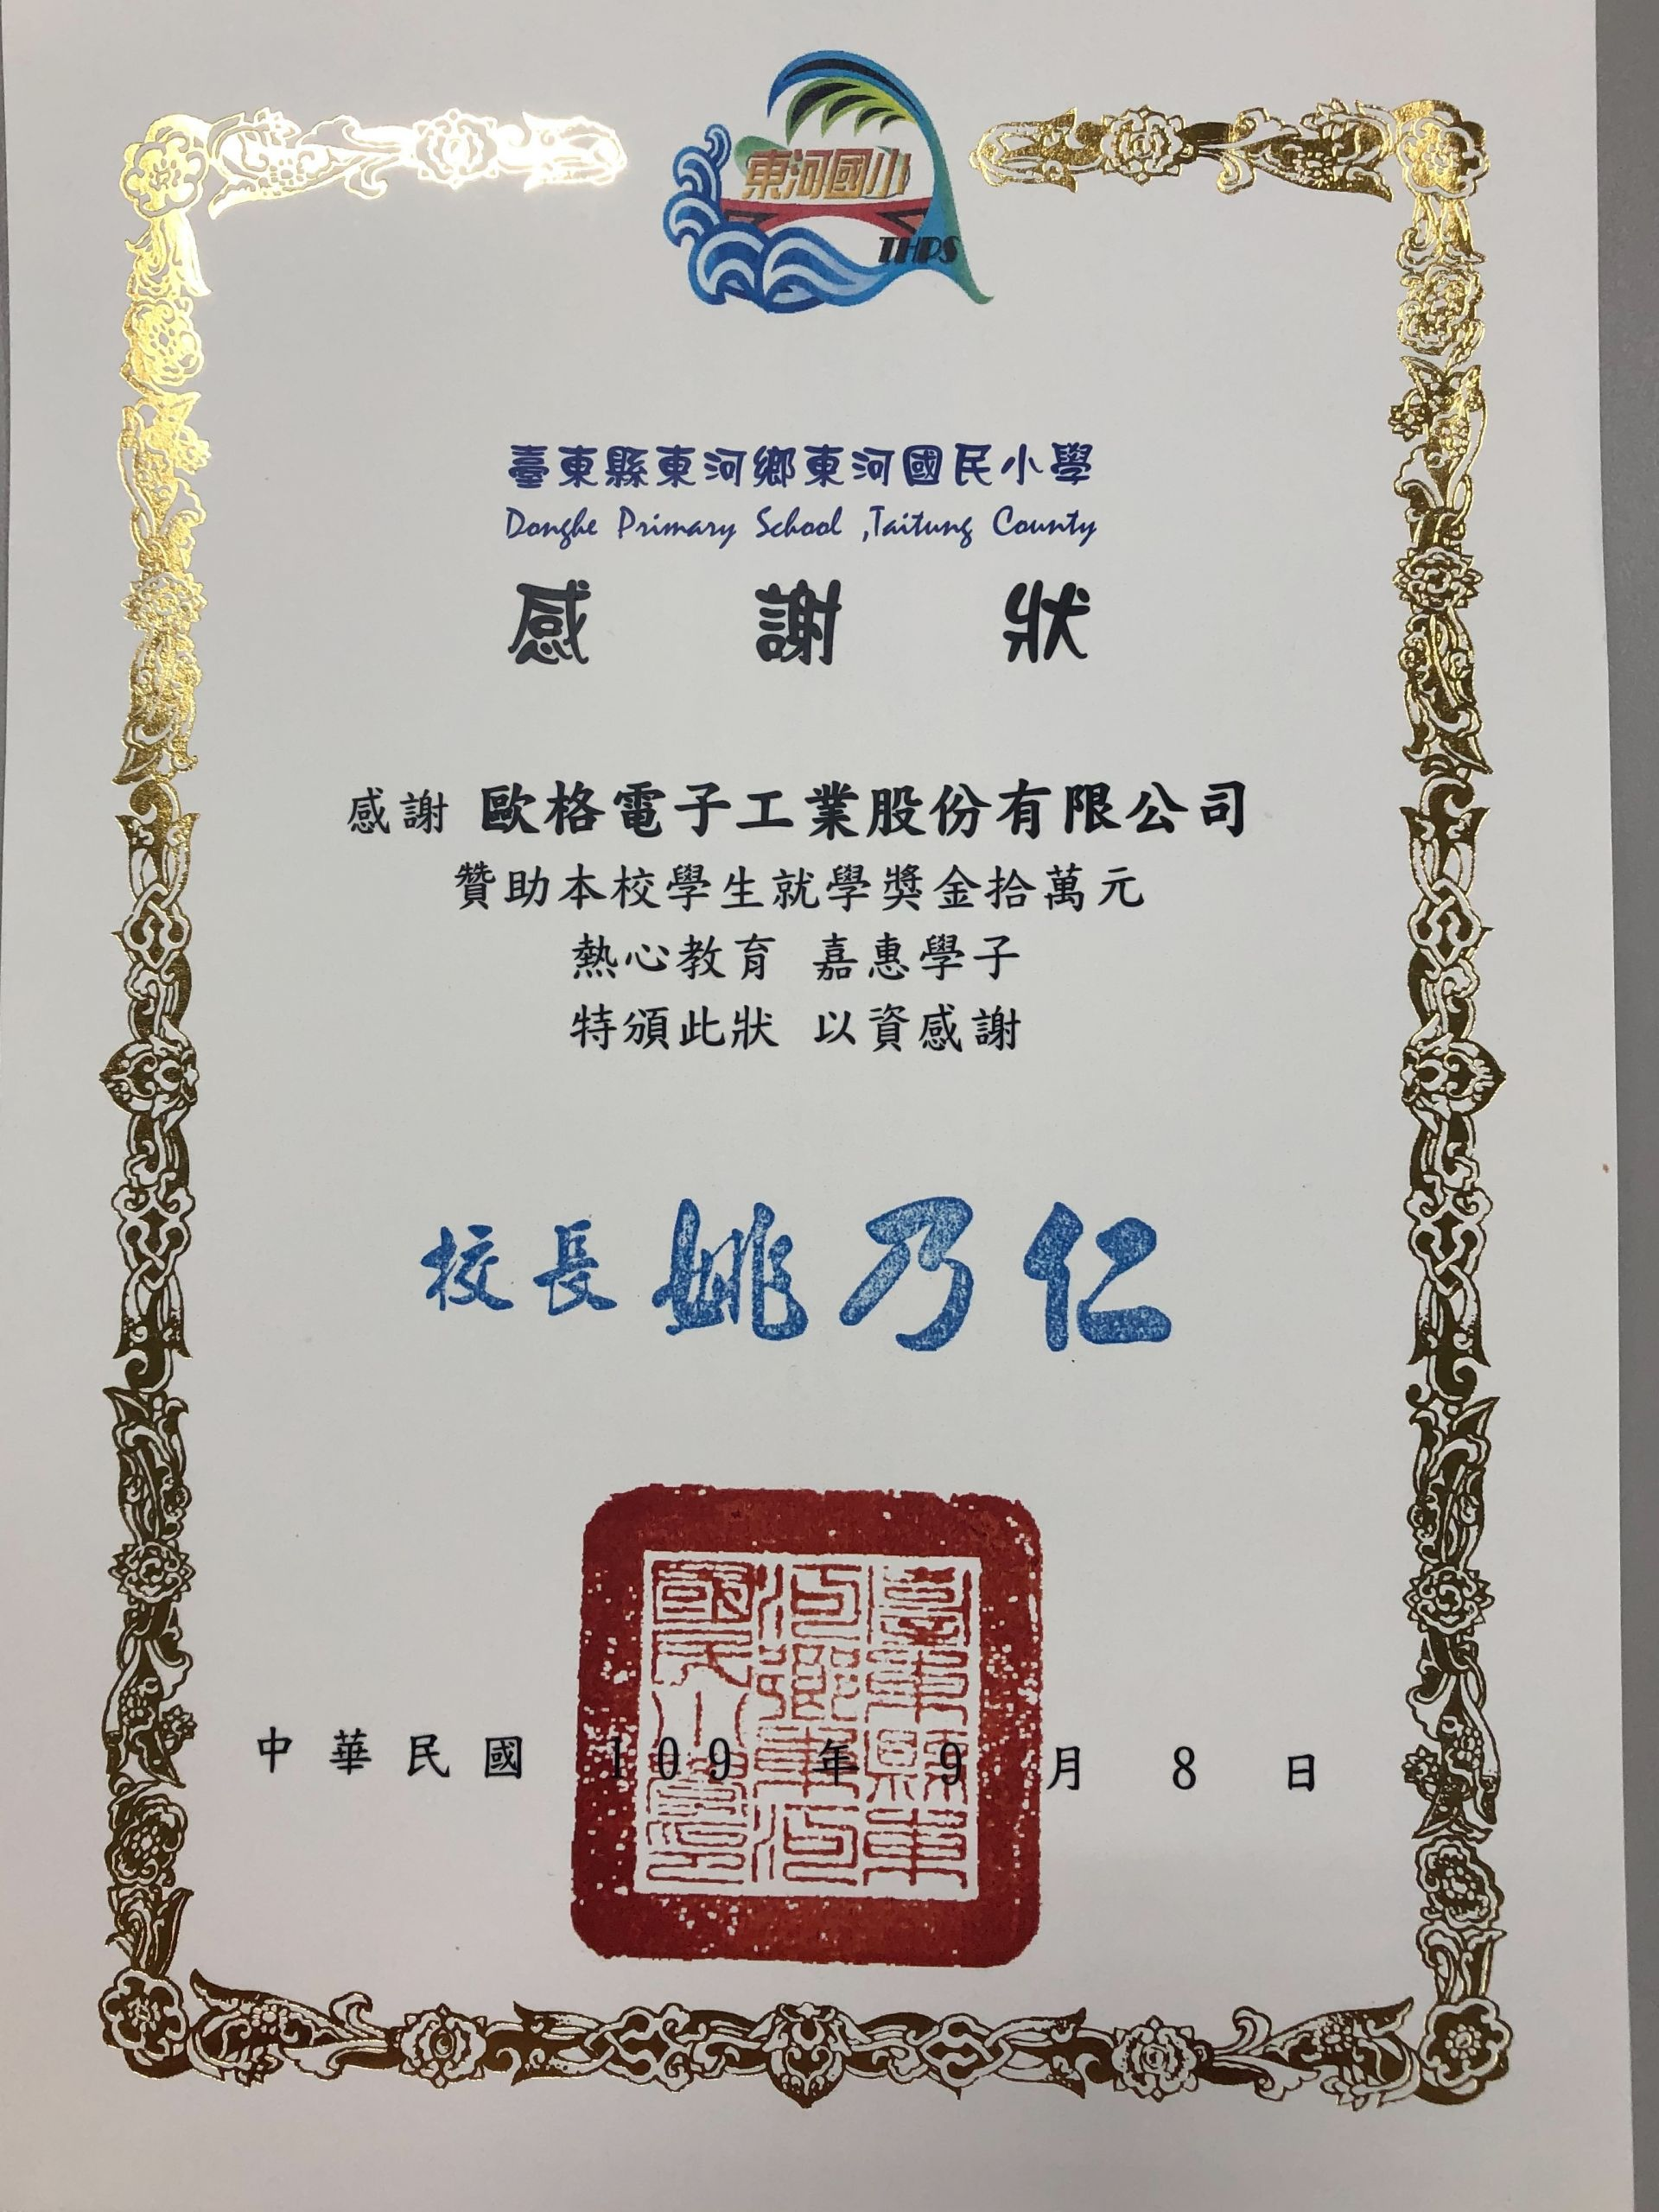 AHOKUは東河小学校から2020年度奨学金感謝状を授与しました